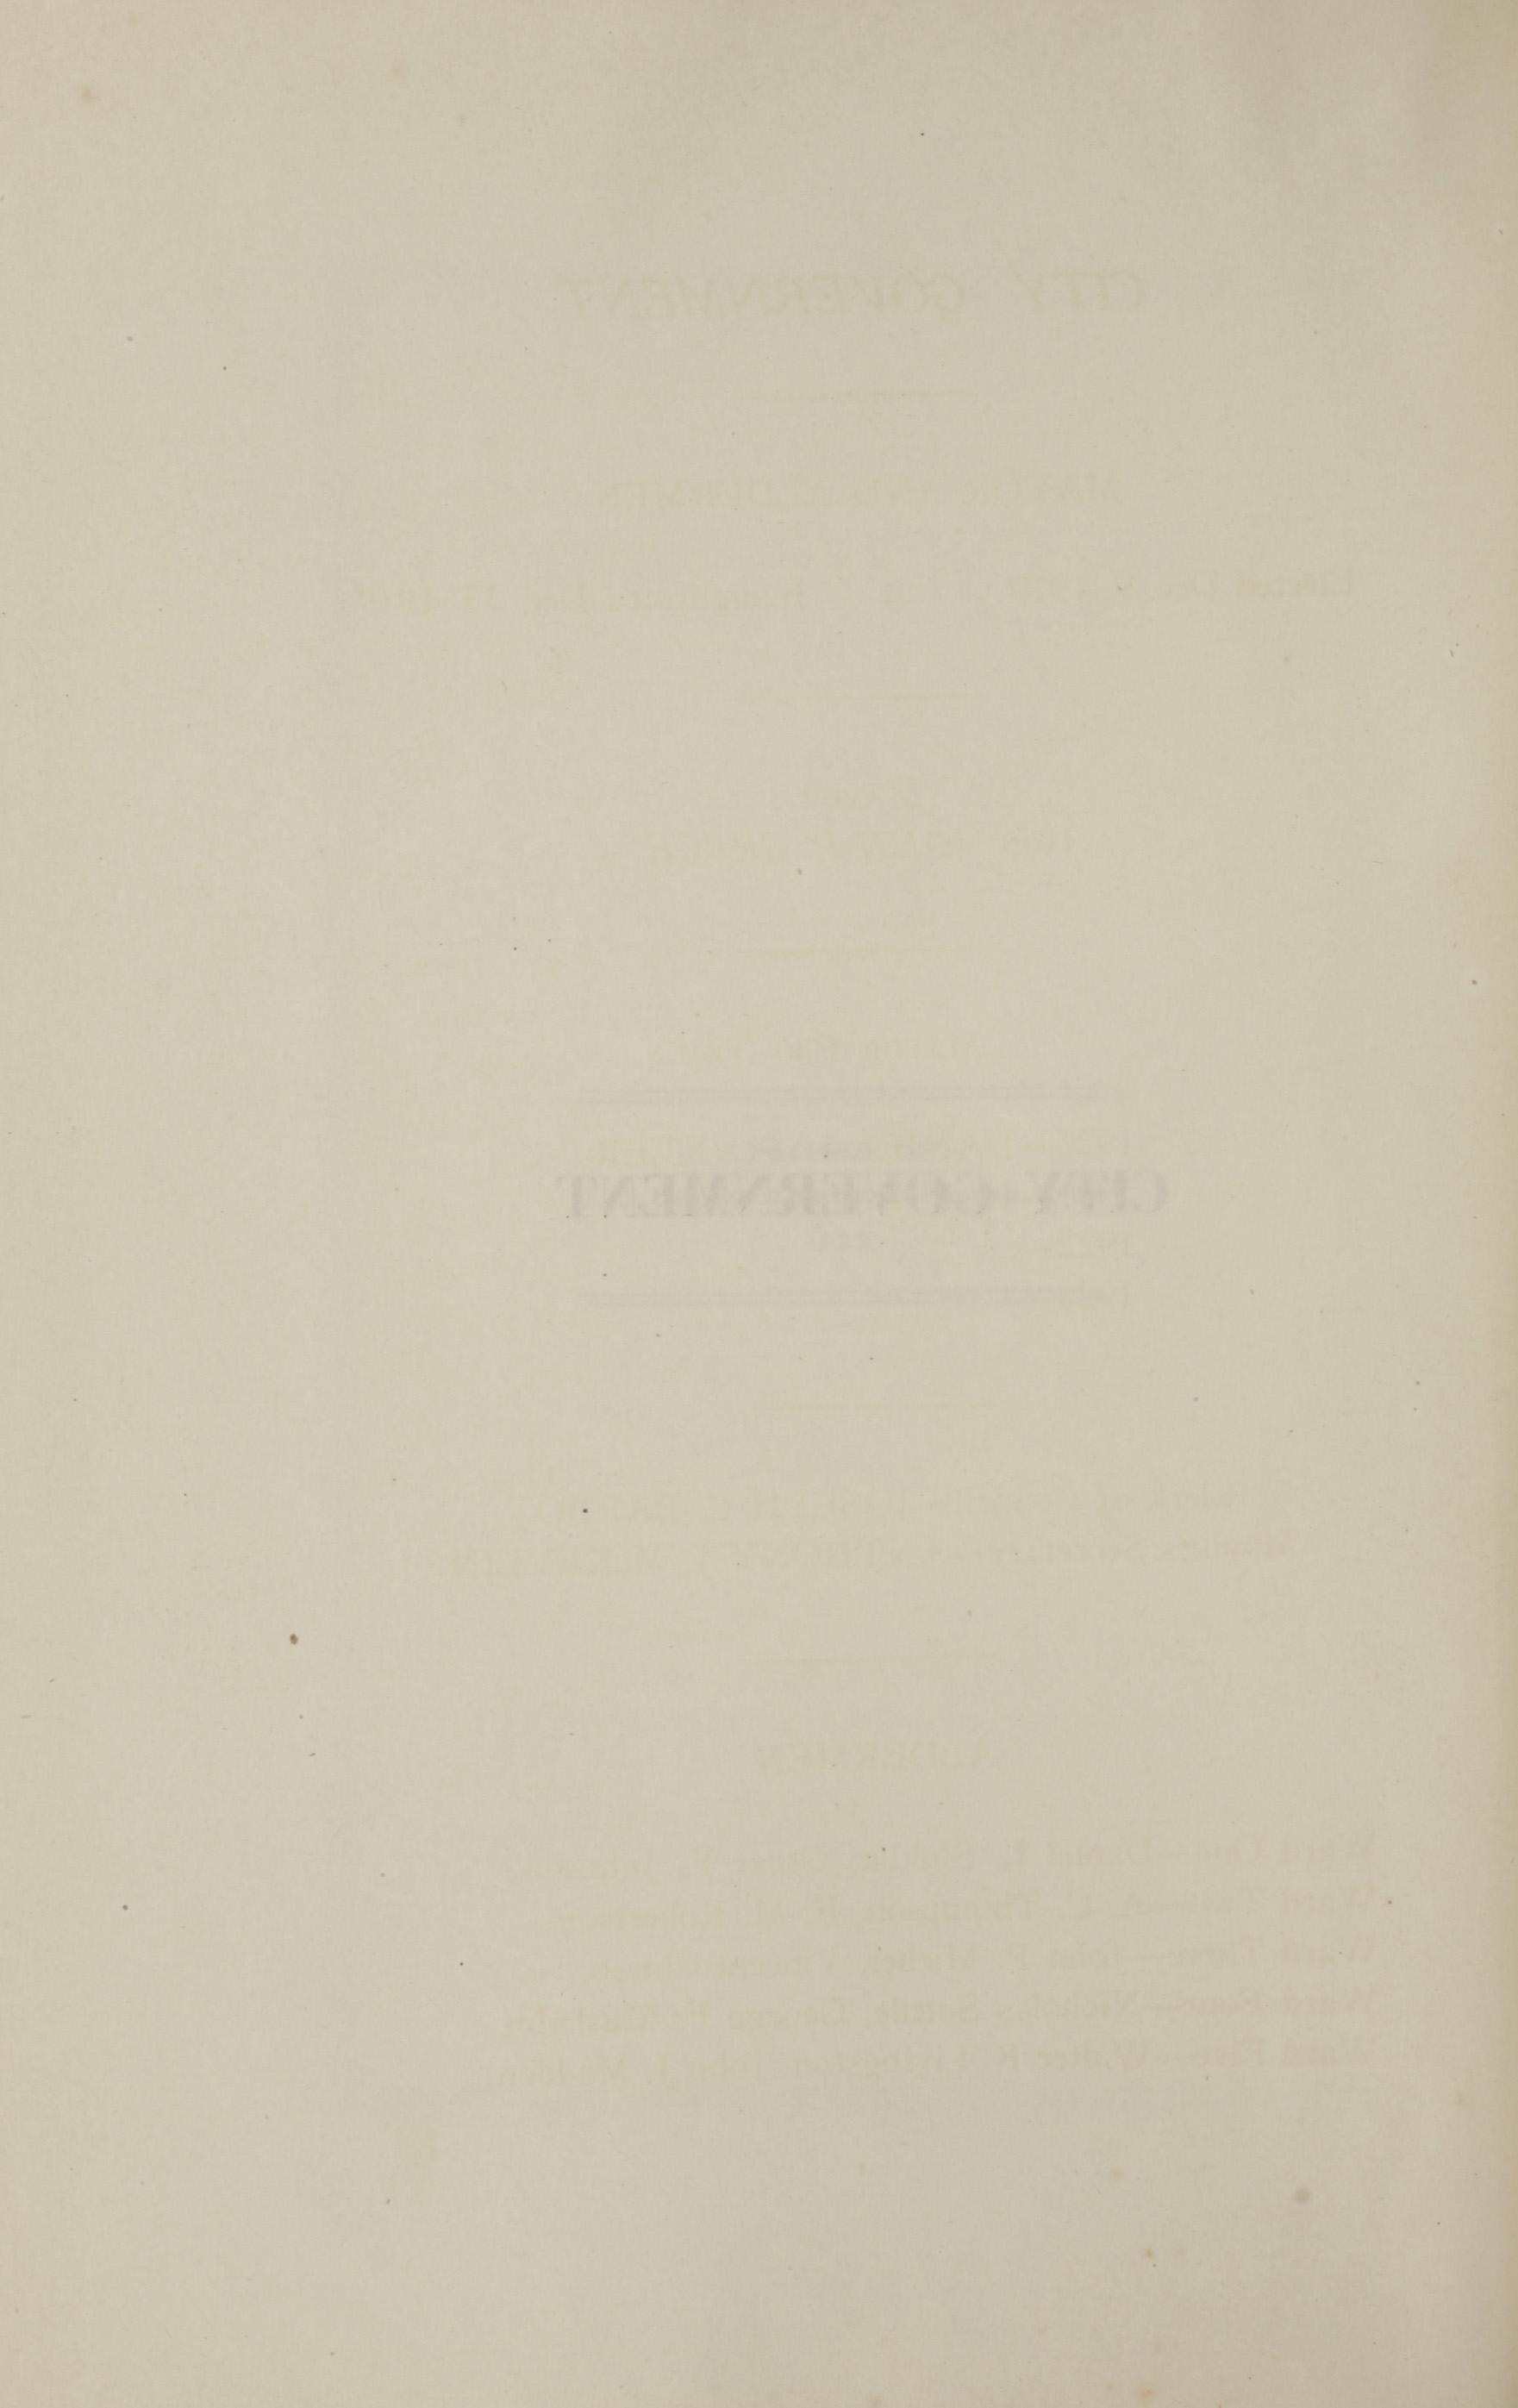 Charleston Yearbook, 1921, page iv